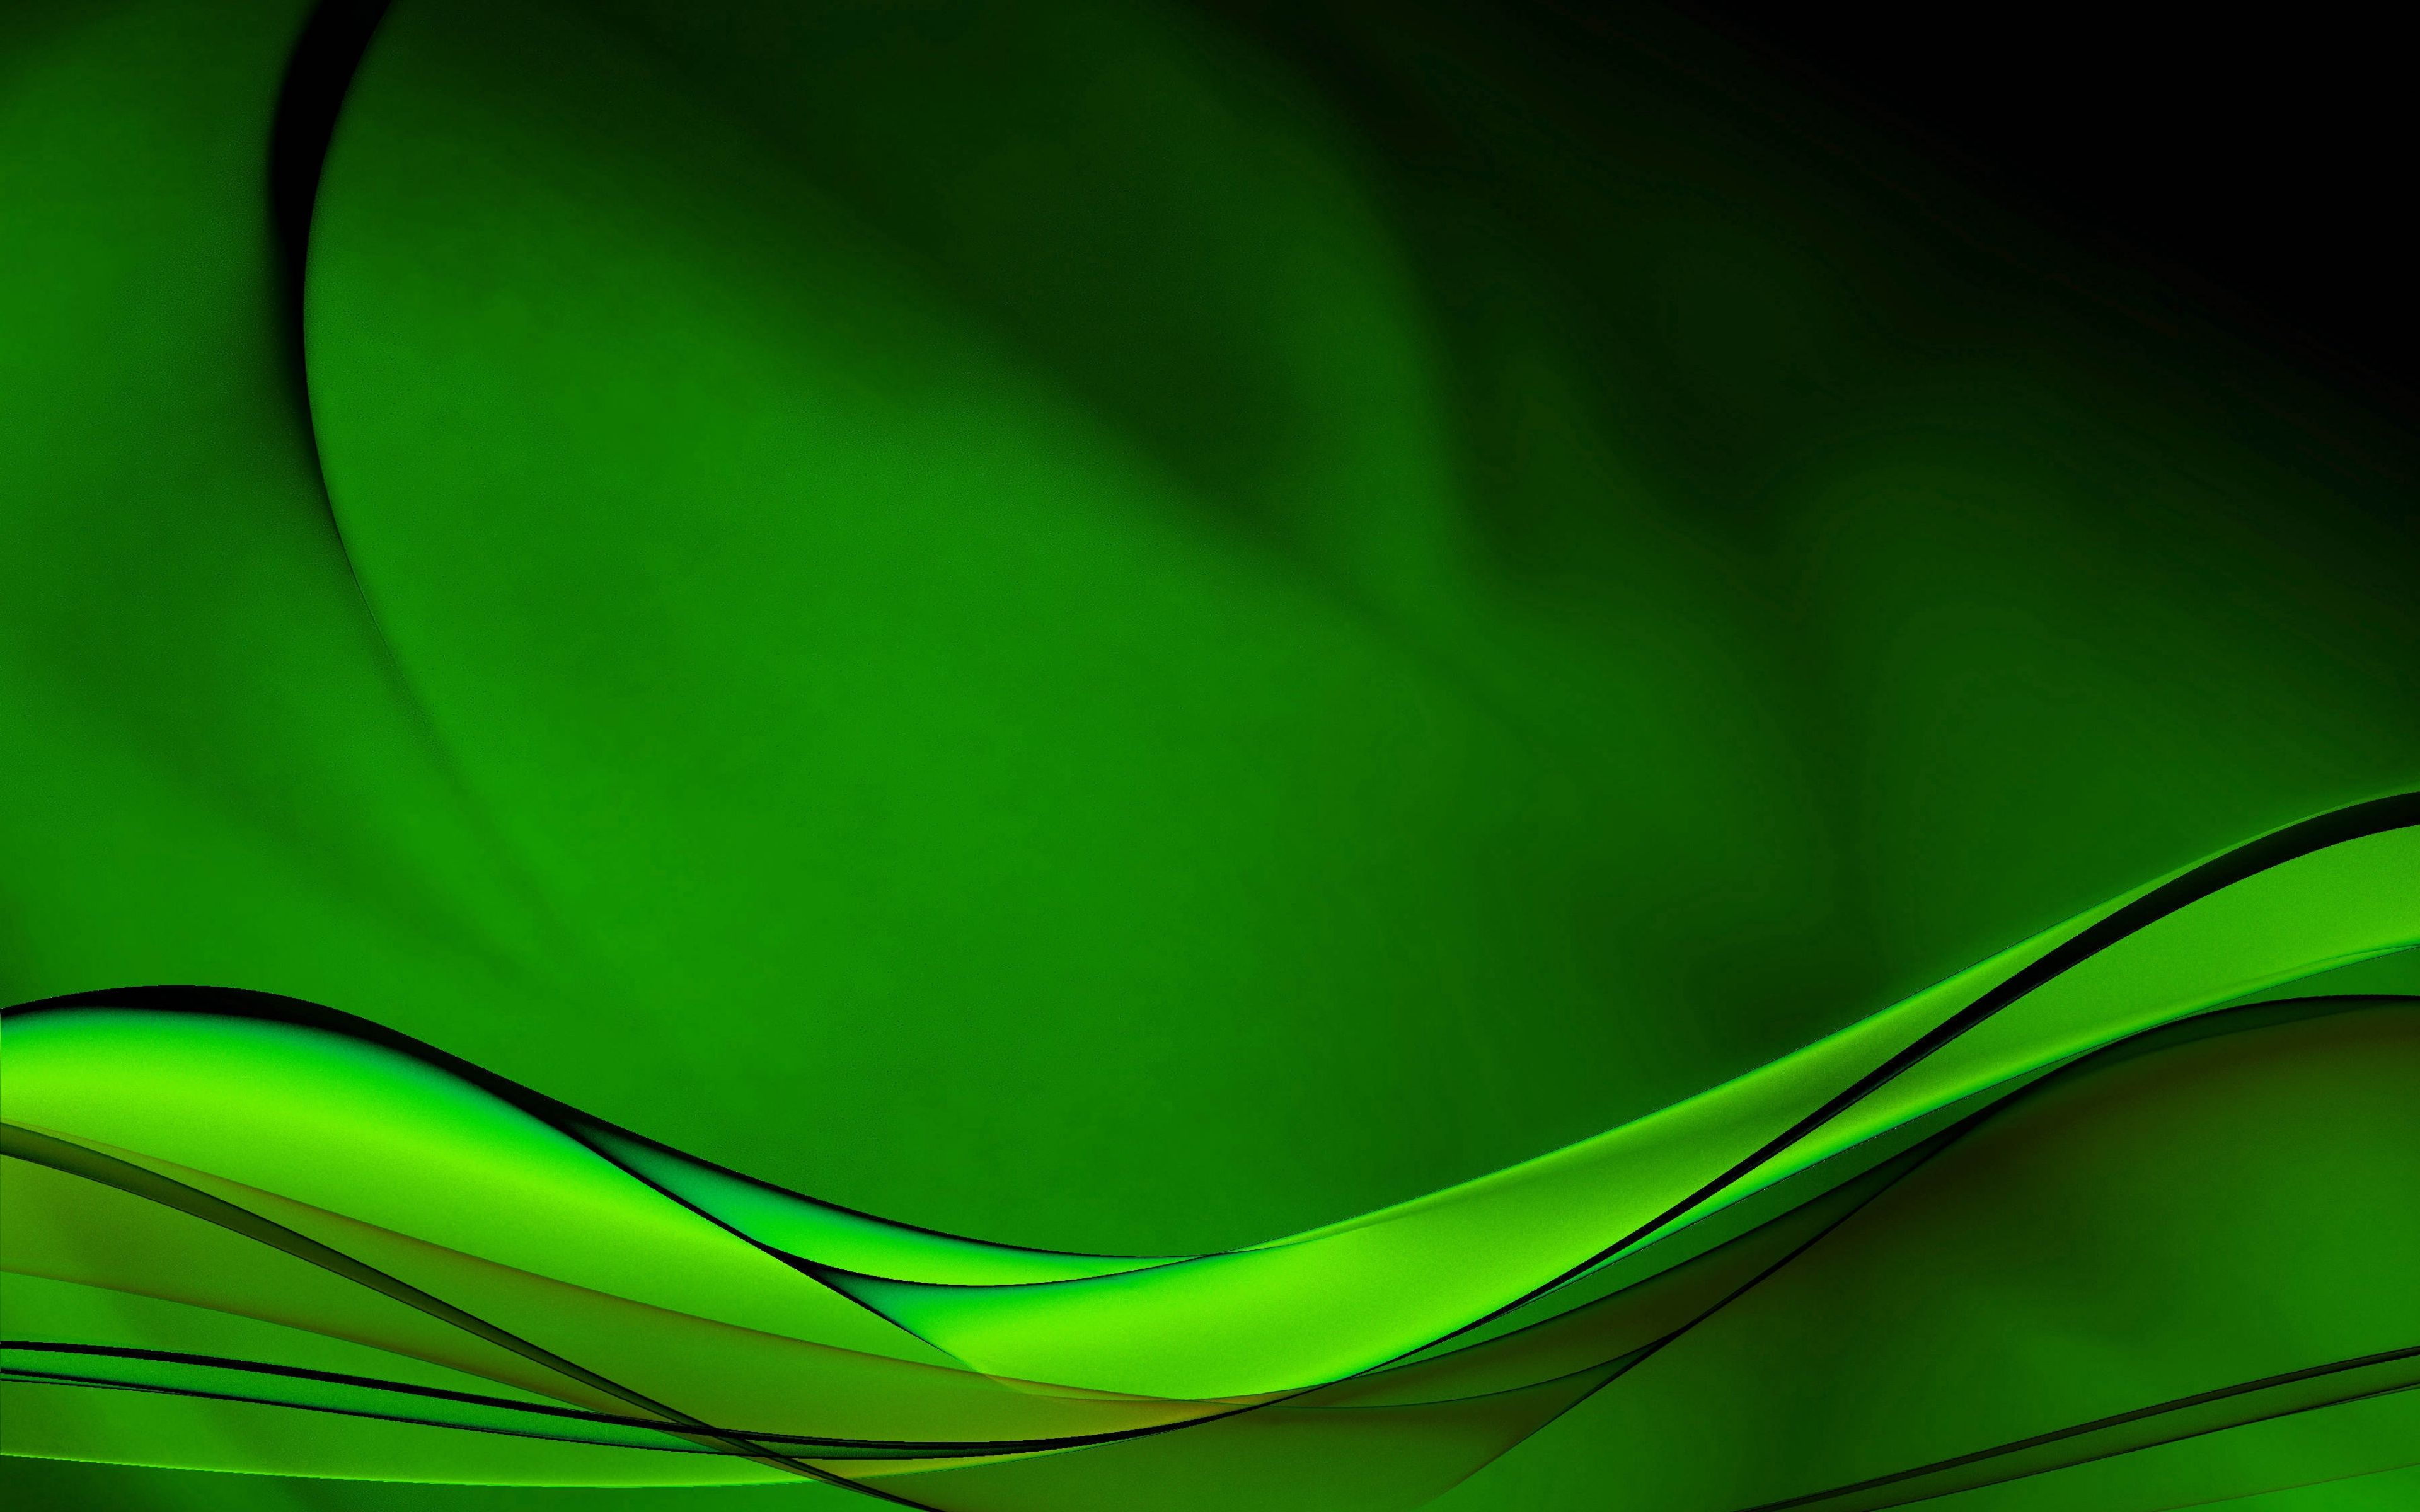 Green background hd wallpapers pulse wallpaper in wallpaper